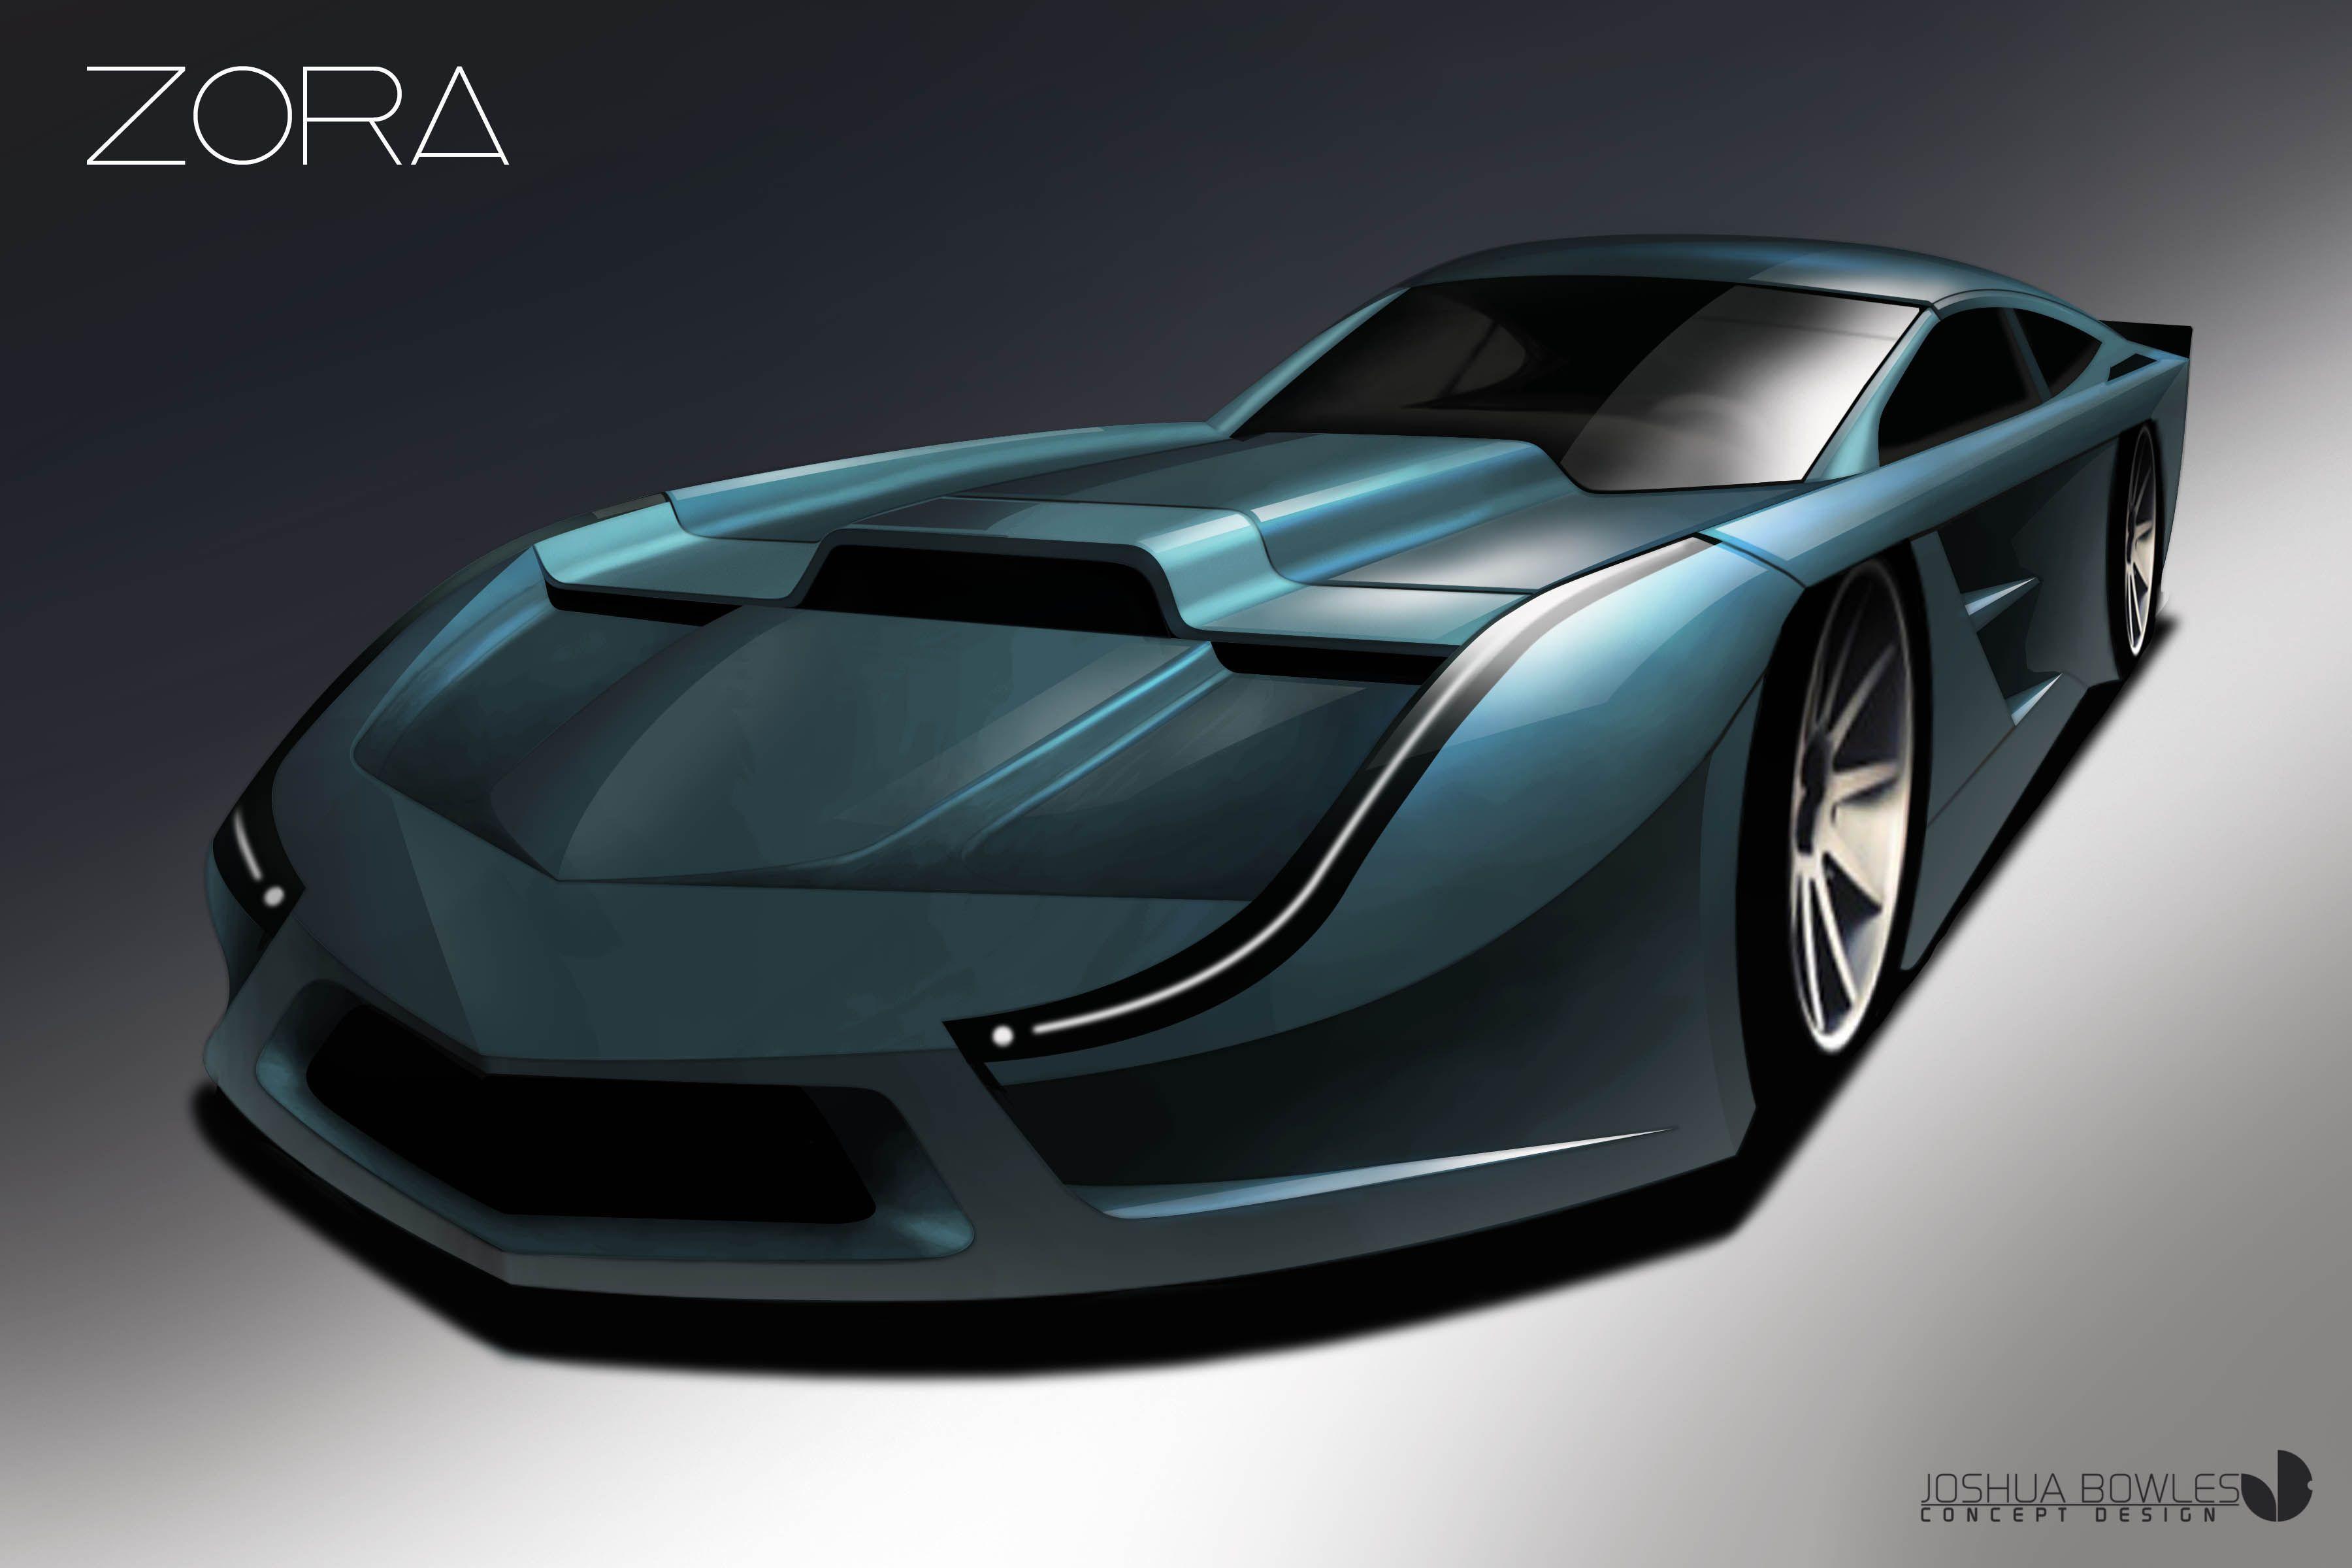 2017 corvette zora zr1 specs price autos concept - 2017 Corvette Zora Zr1 Concept Car Google Da Ara